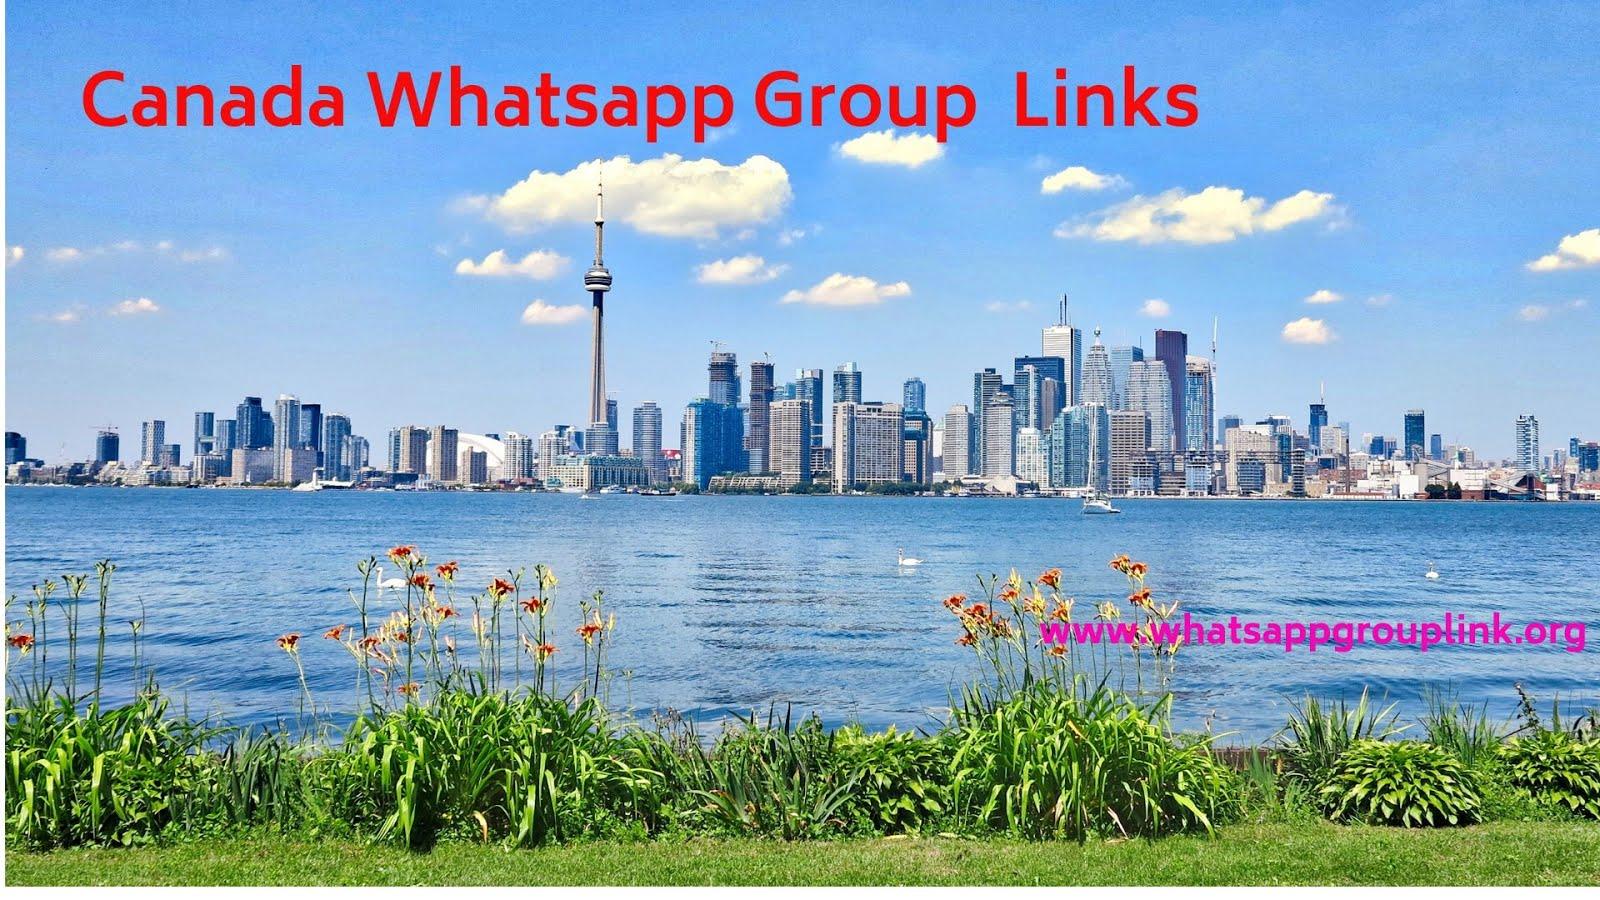 Whatsapp Group Link: Canada Whatsapp Group Links